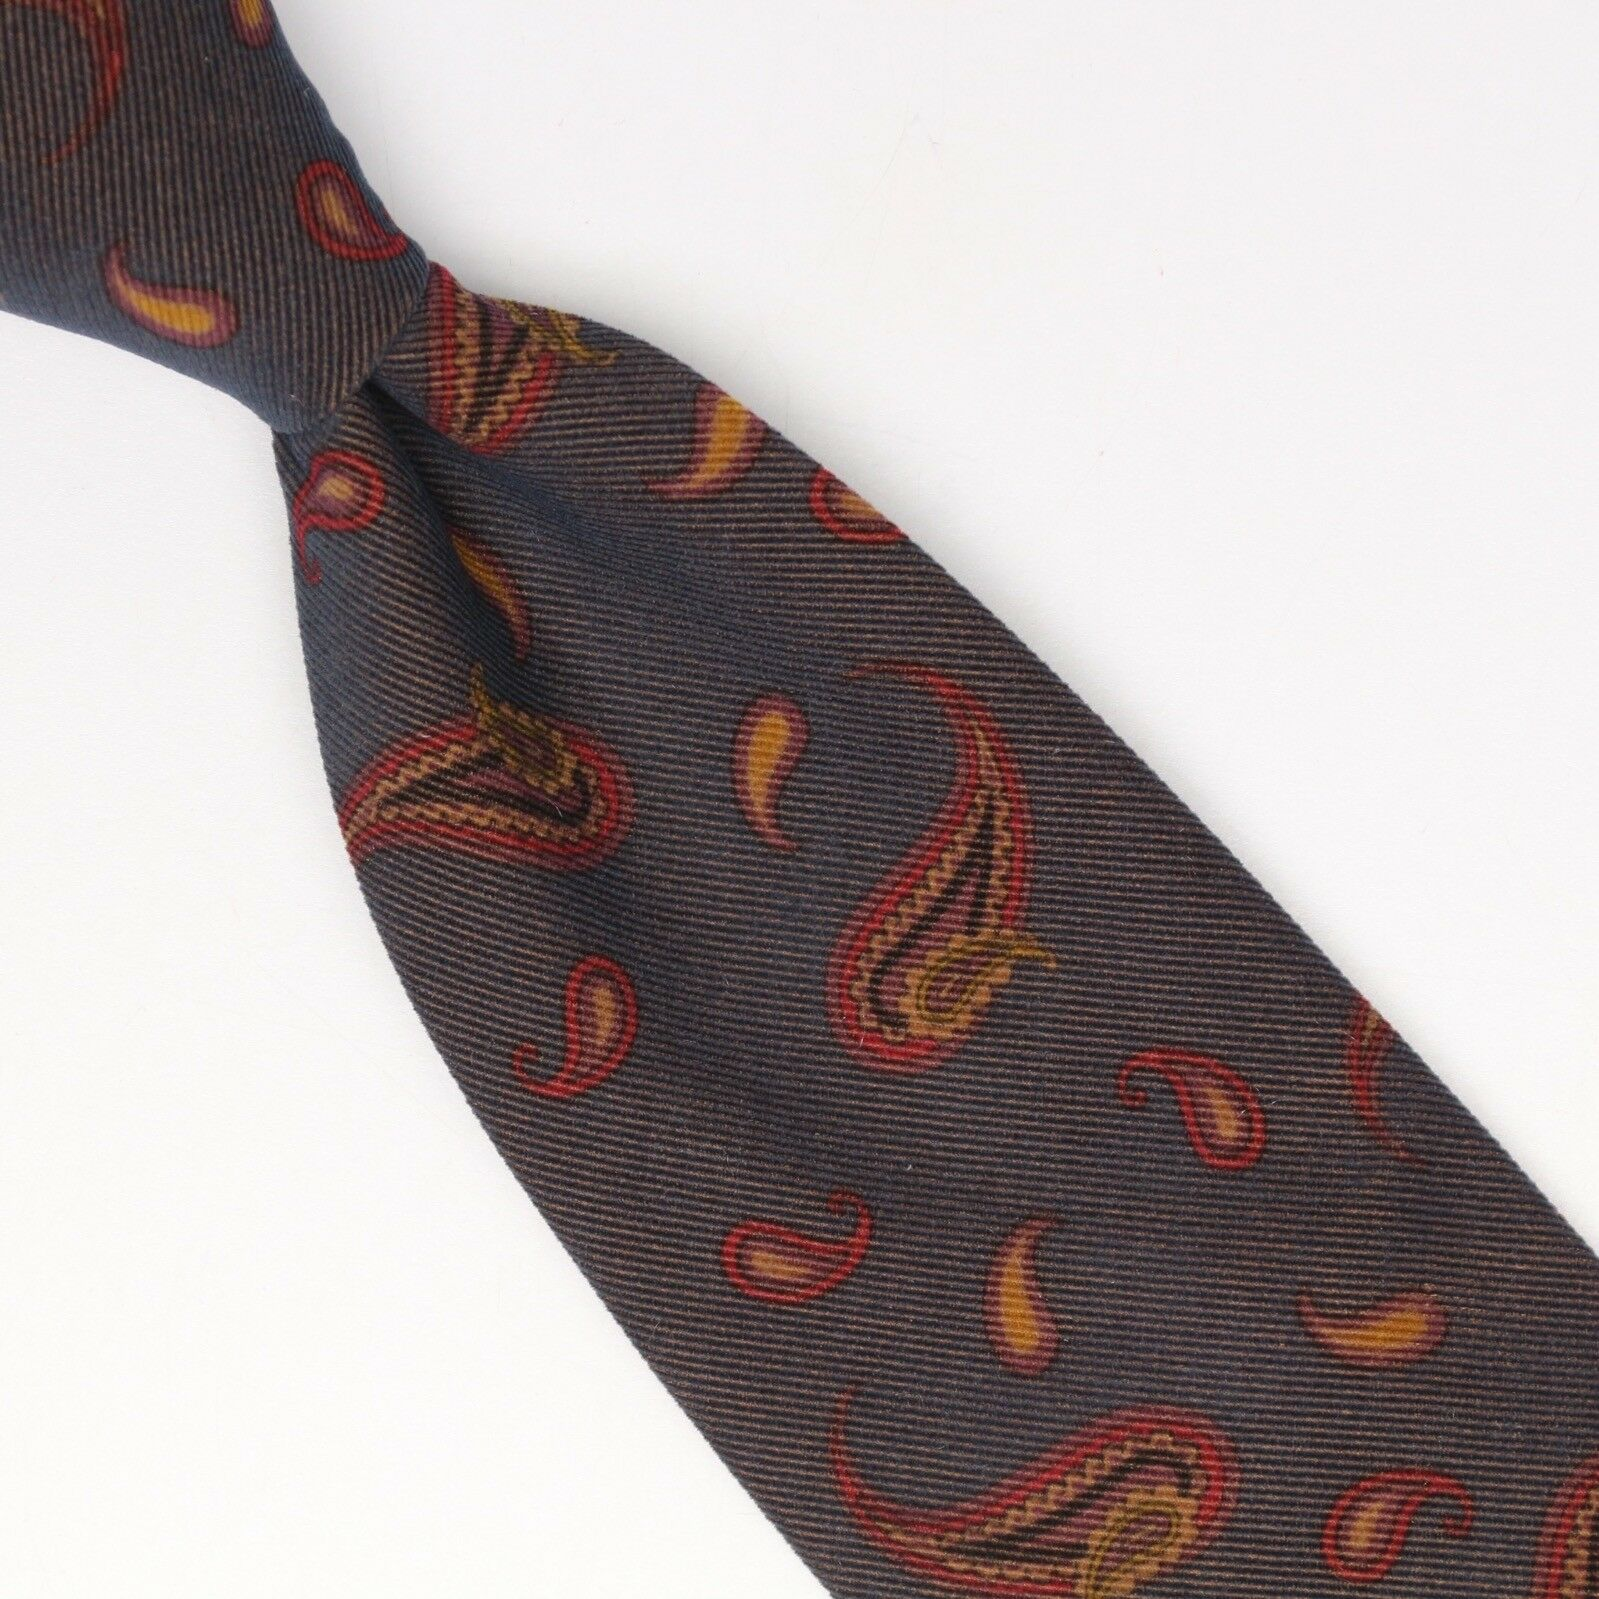 John G Hardy Herren Baumwolle Kord Krawatte Grau Weinrot Beige Paisleymuster